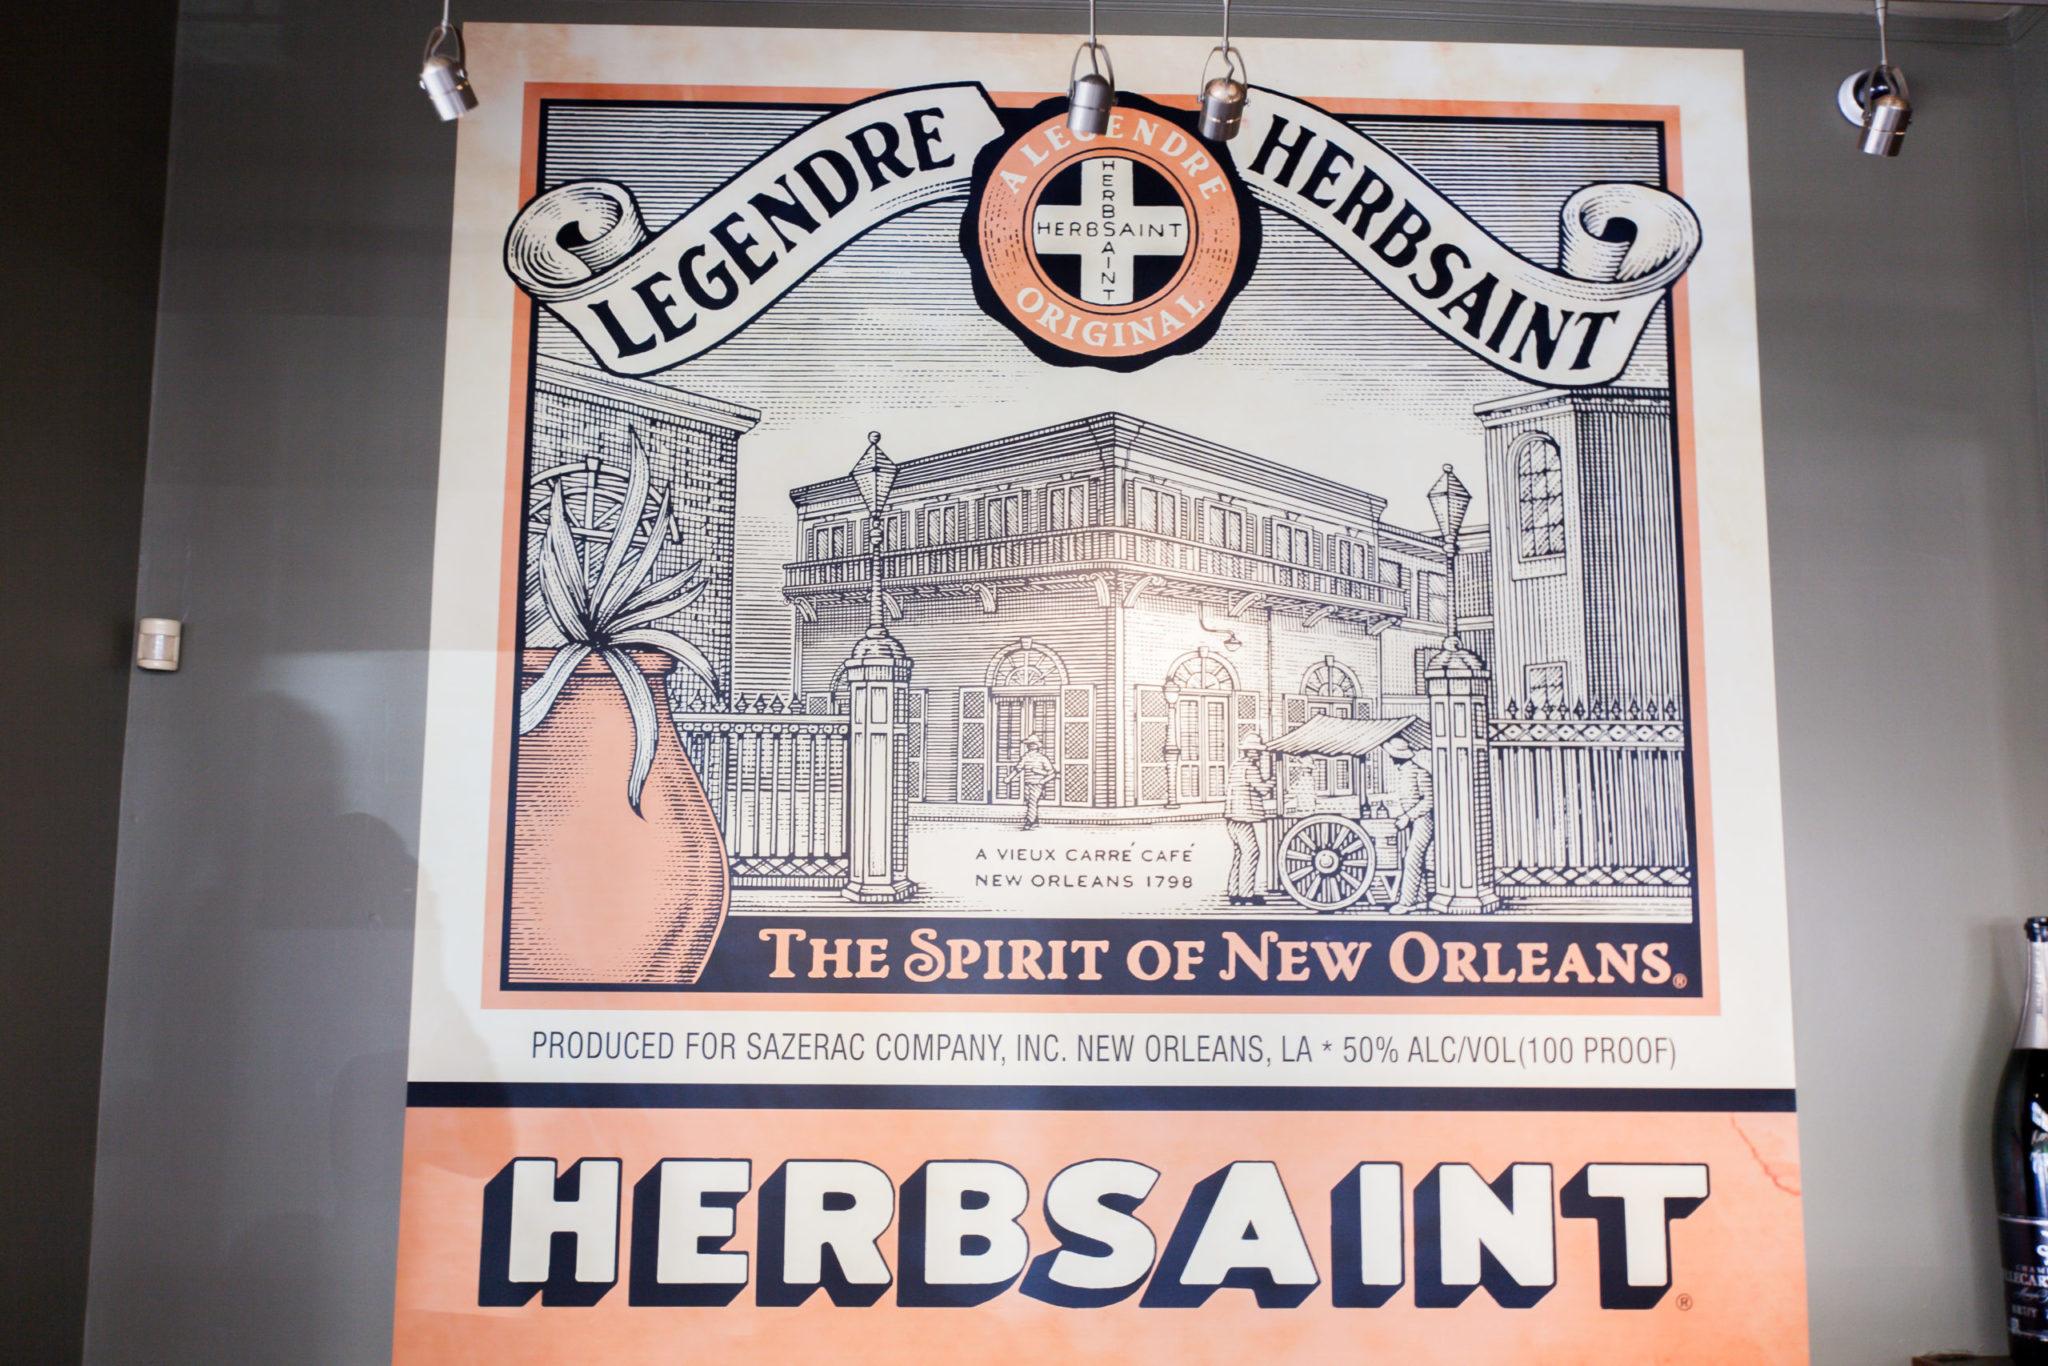 Herbasaint